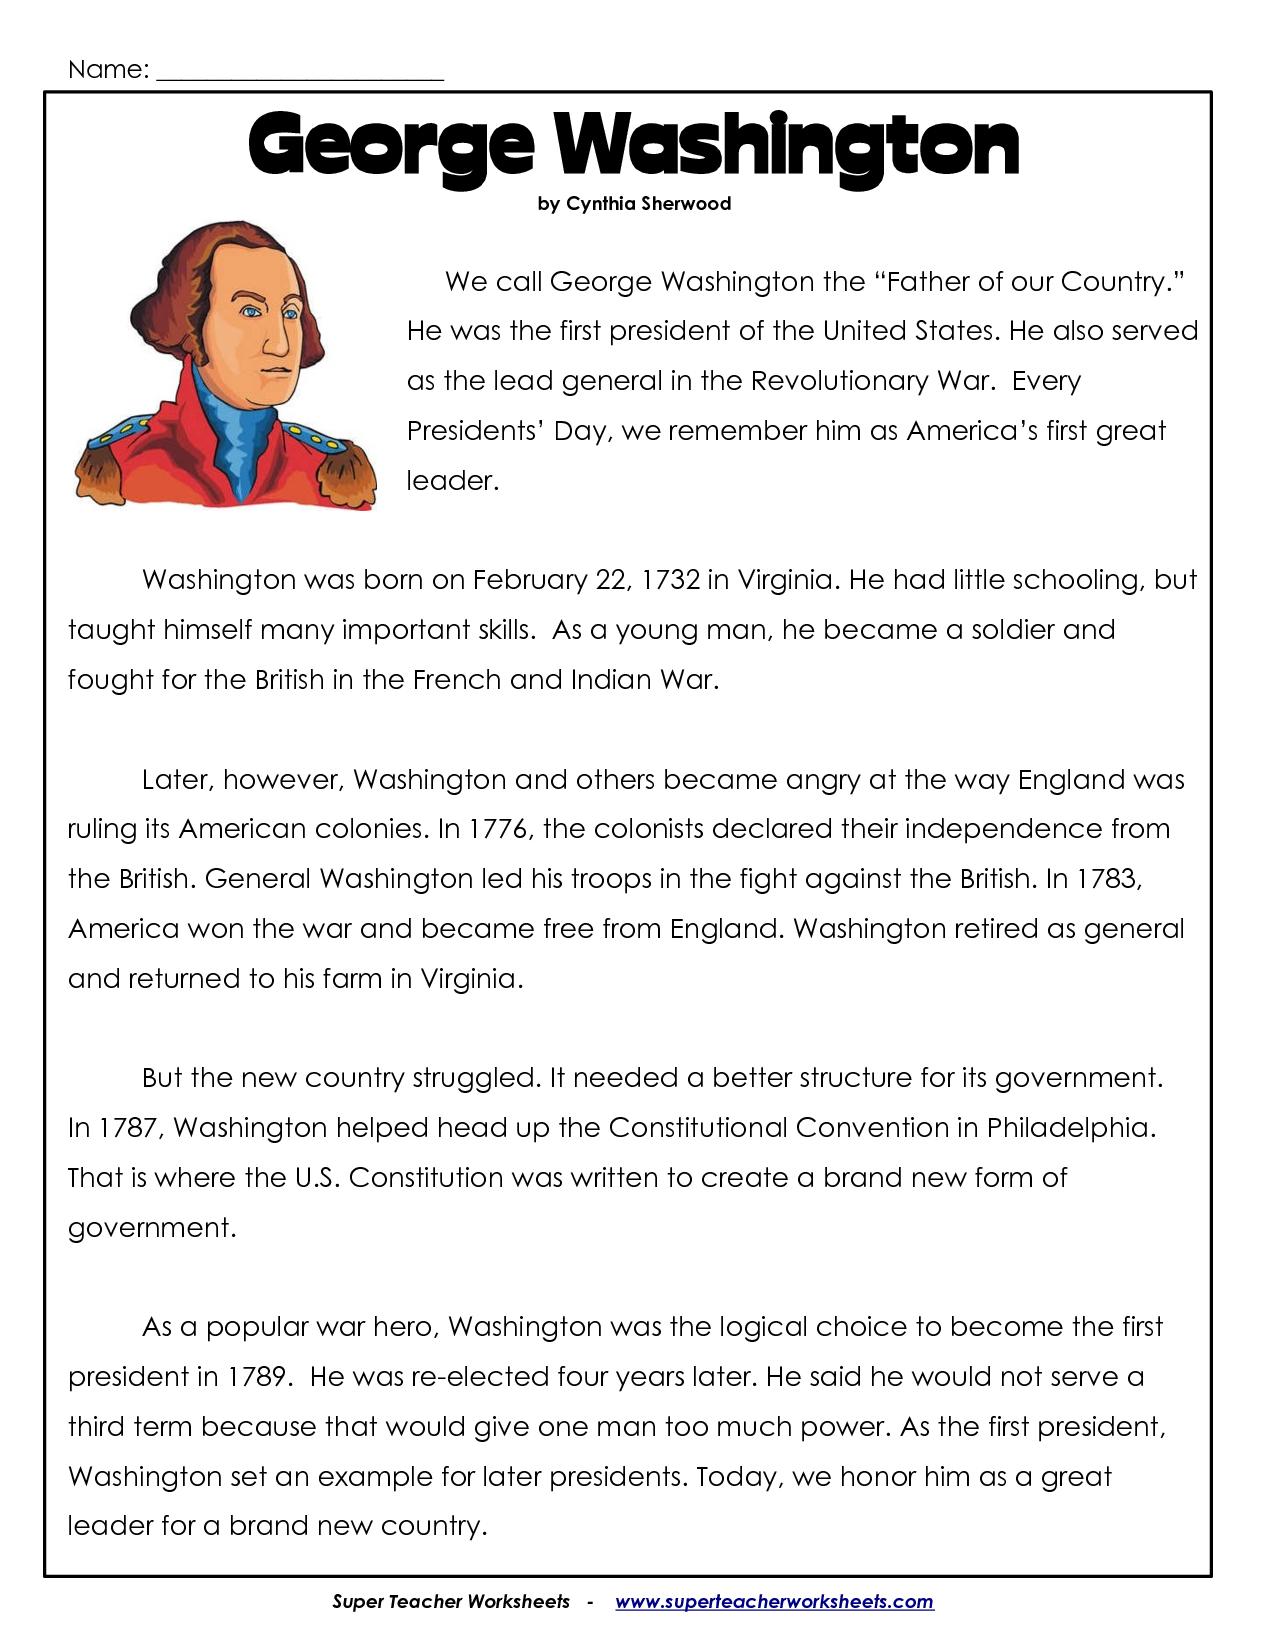 President's Day Coloring Worksheet | George Washington Worksheets - Free Printable George Washington Worksheets